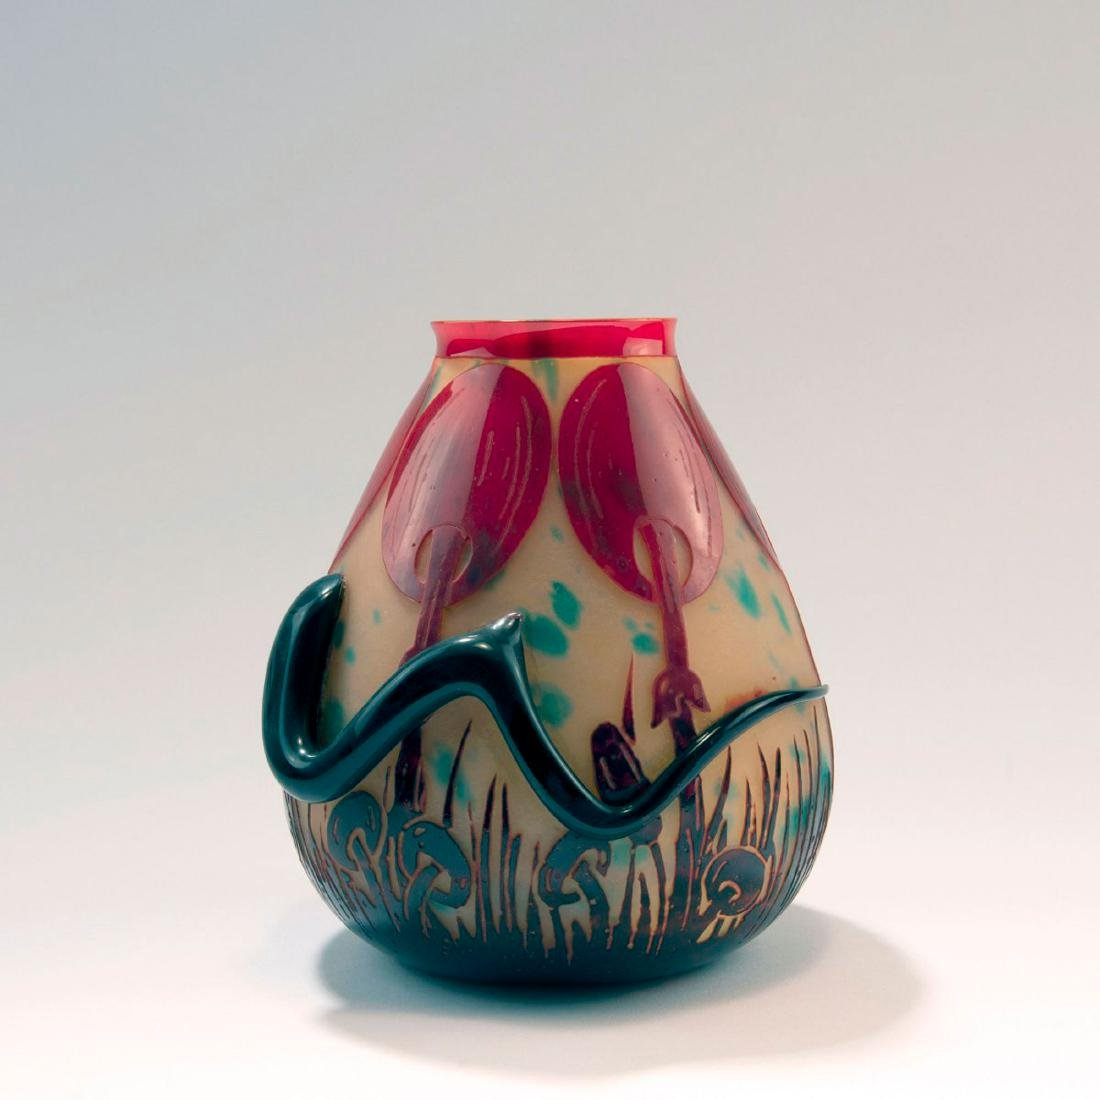 'Coprins' vase, 1923-26